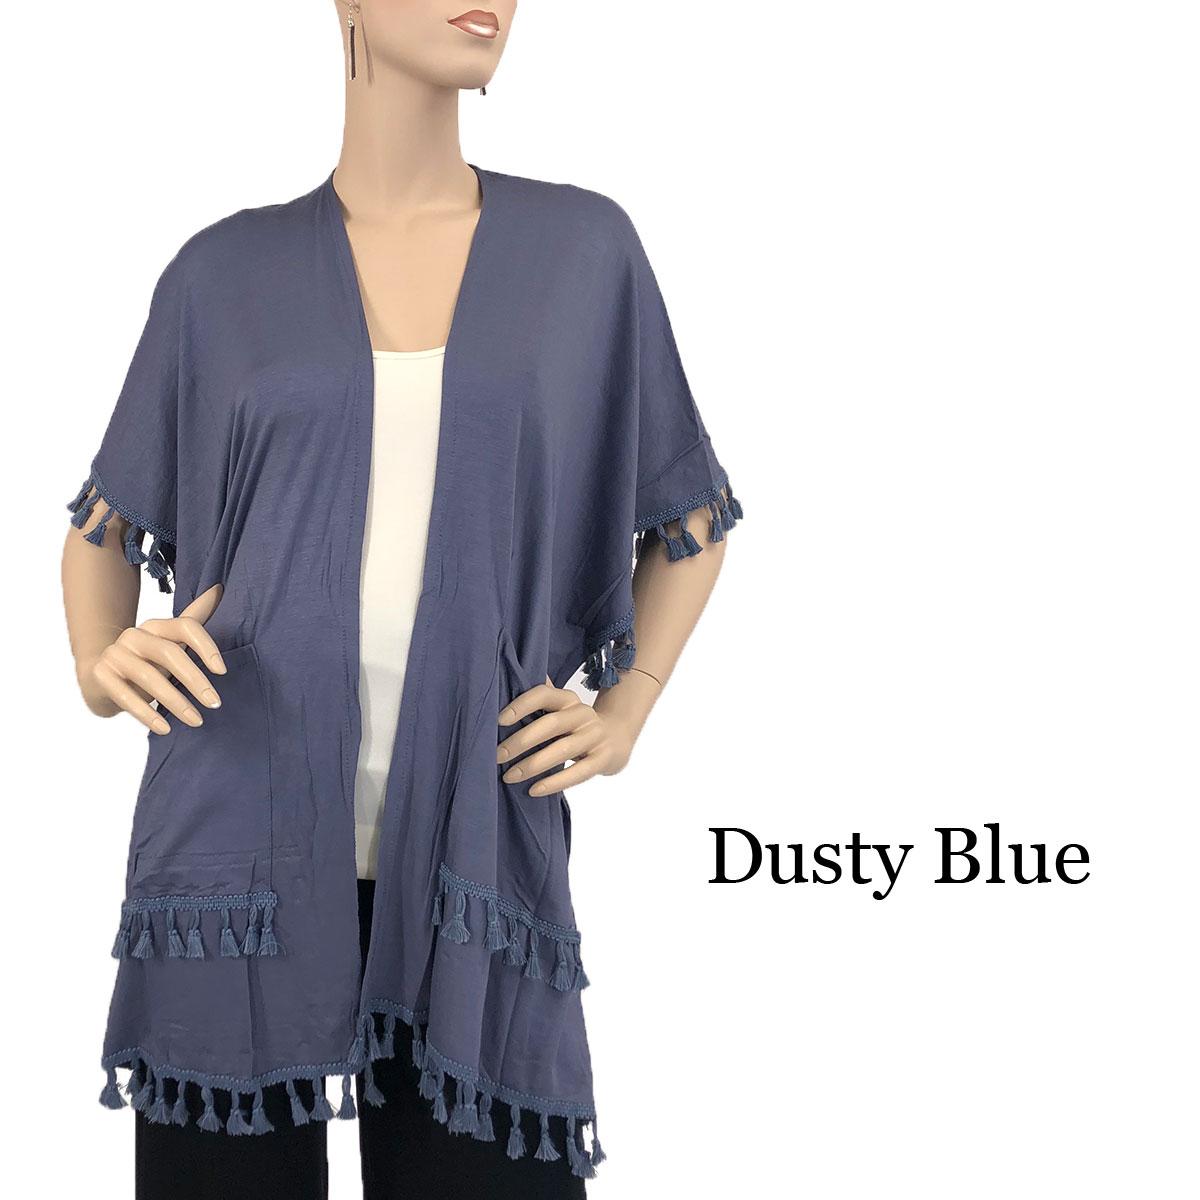 Kimono - Solid w/ Tassels & Pockets 9771 - Dusty Blue